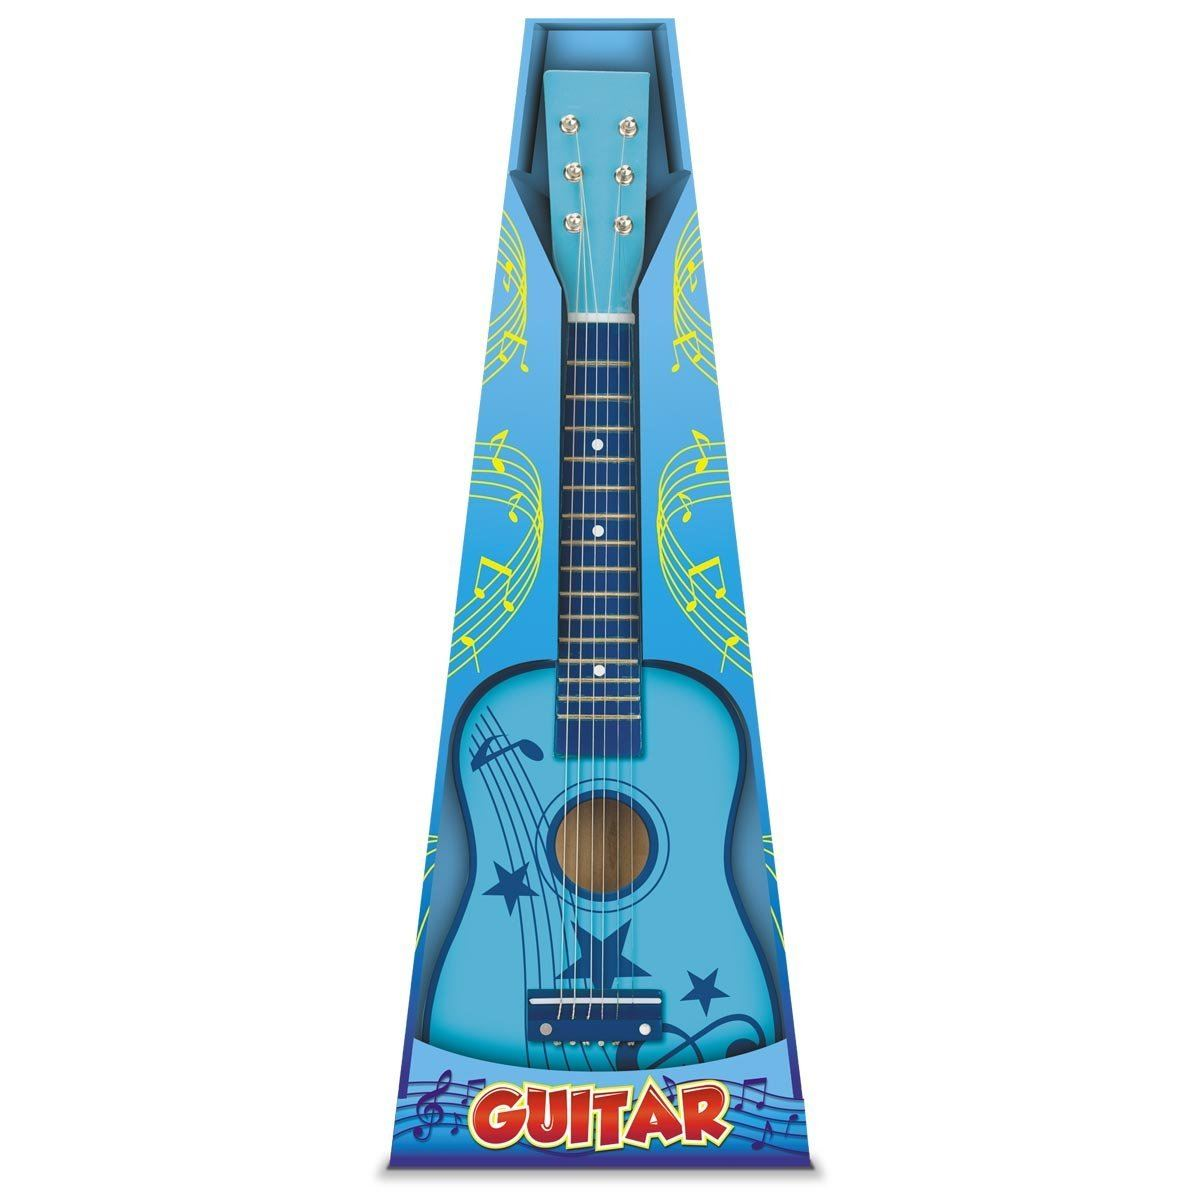 toyrific wooden wood childrens kids girls boys 23 guitar musical instrument. Black Bedroom Furniture Sets. Home Design Ideas